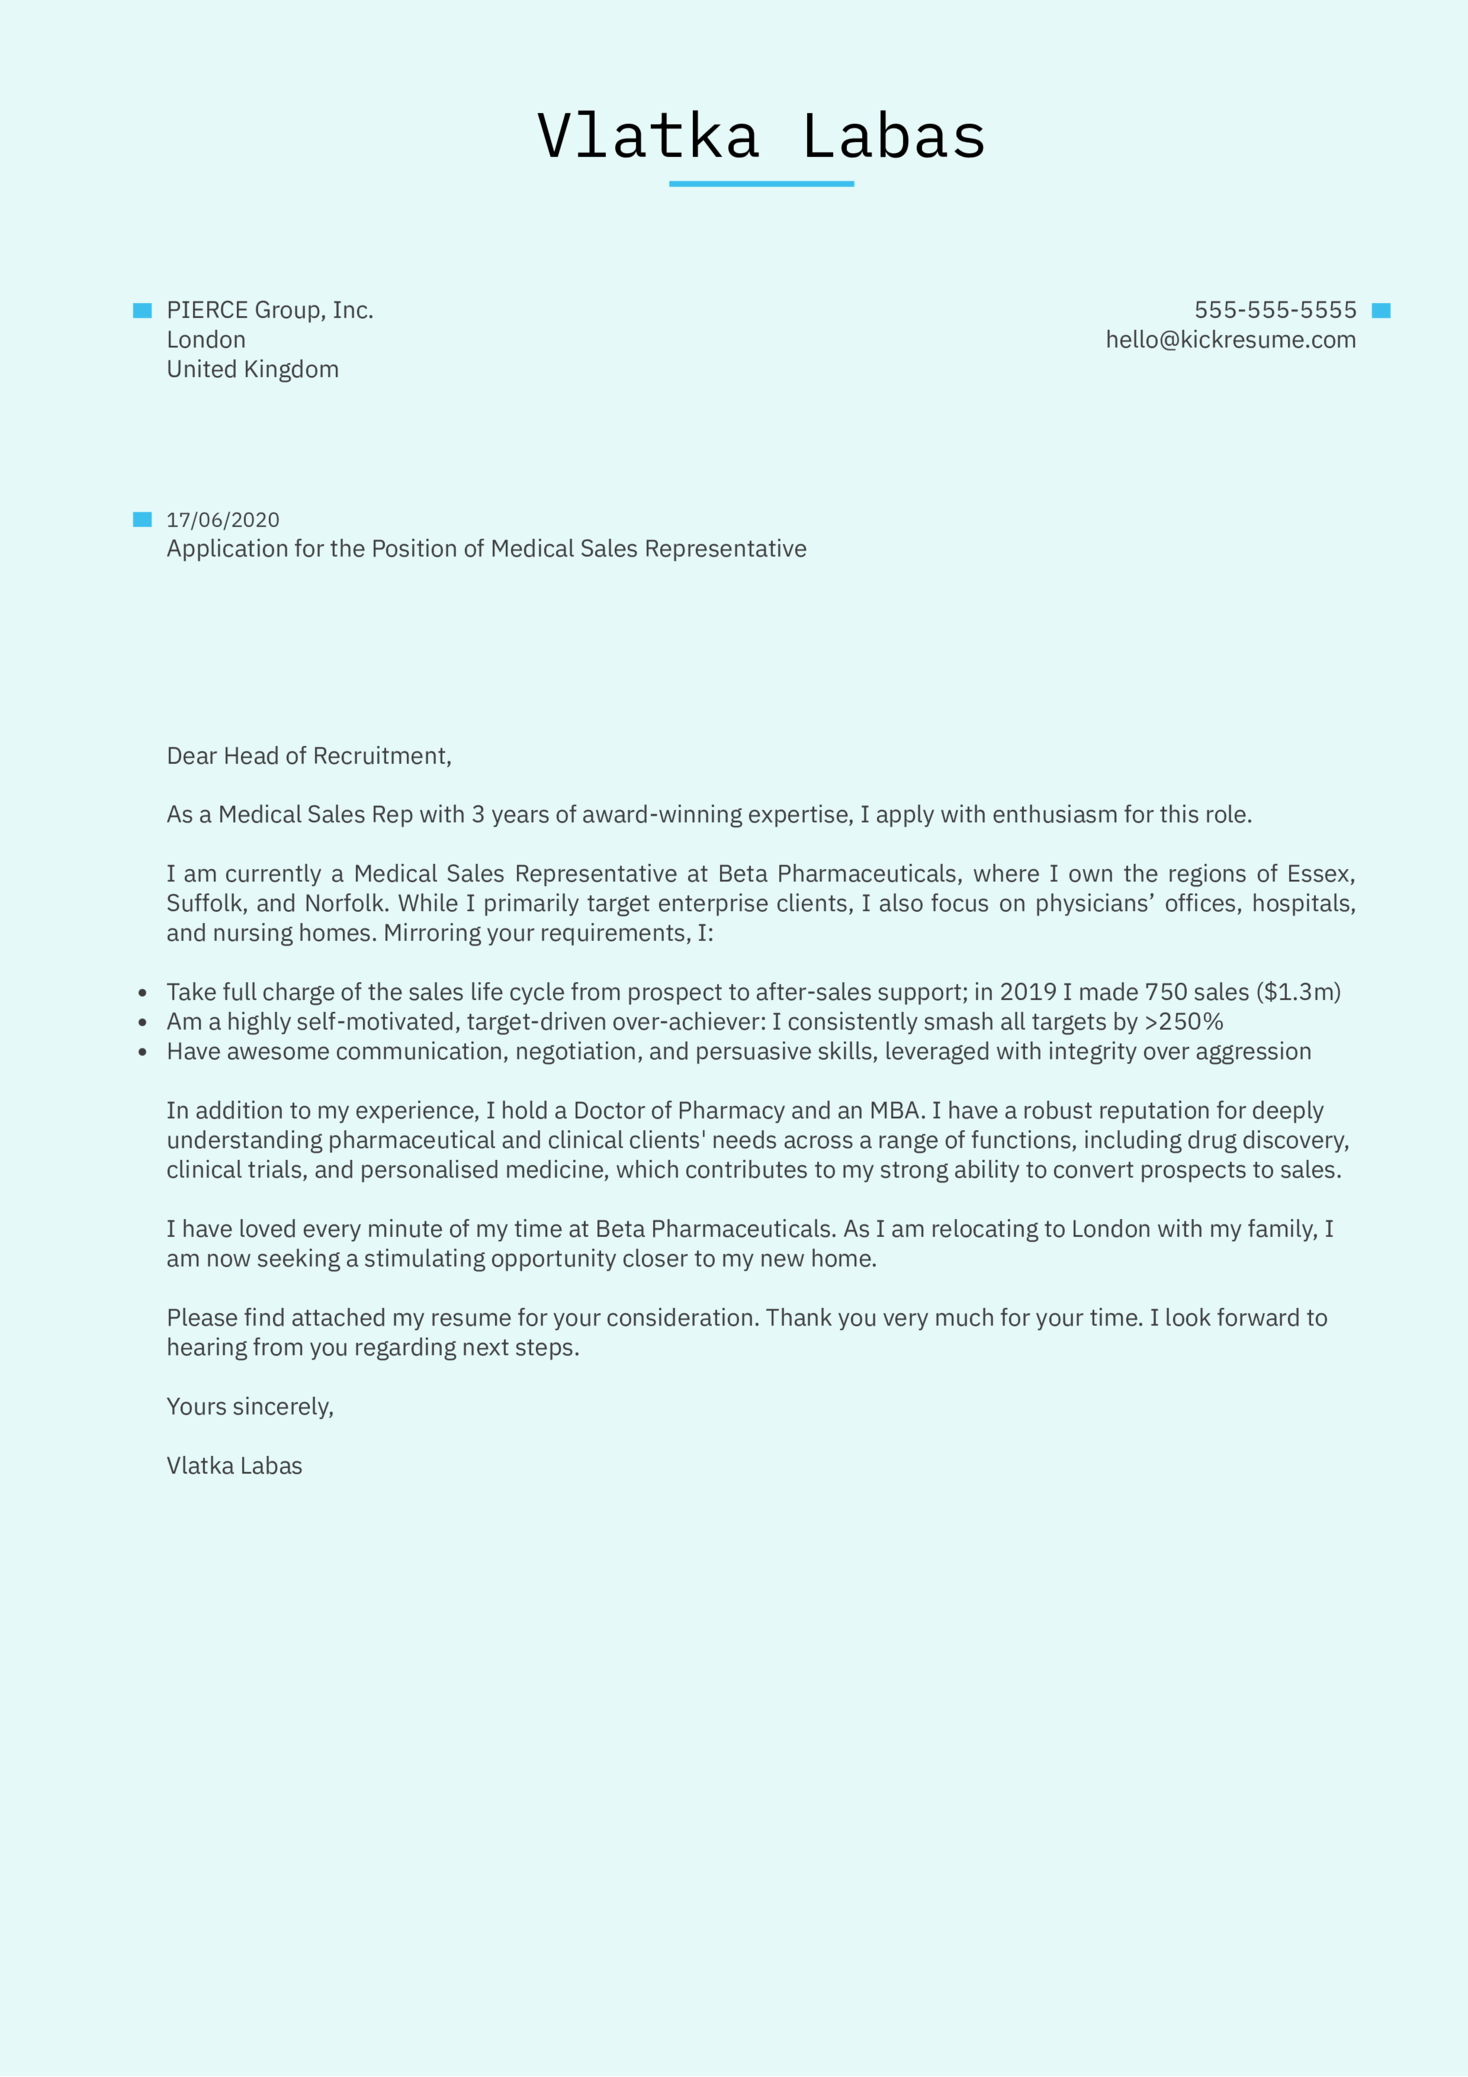 Medical Sales Representative Cover Letter Example Kickresume